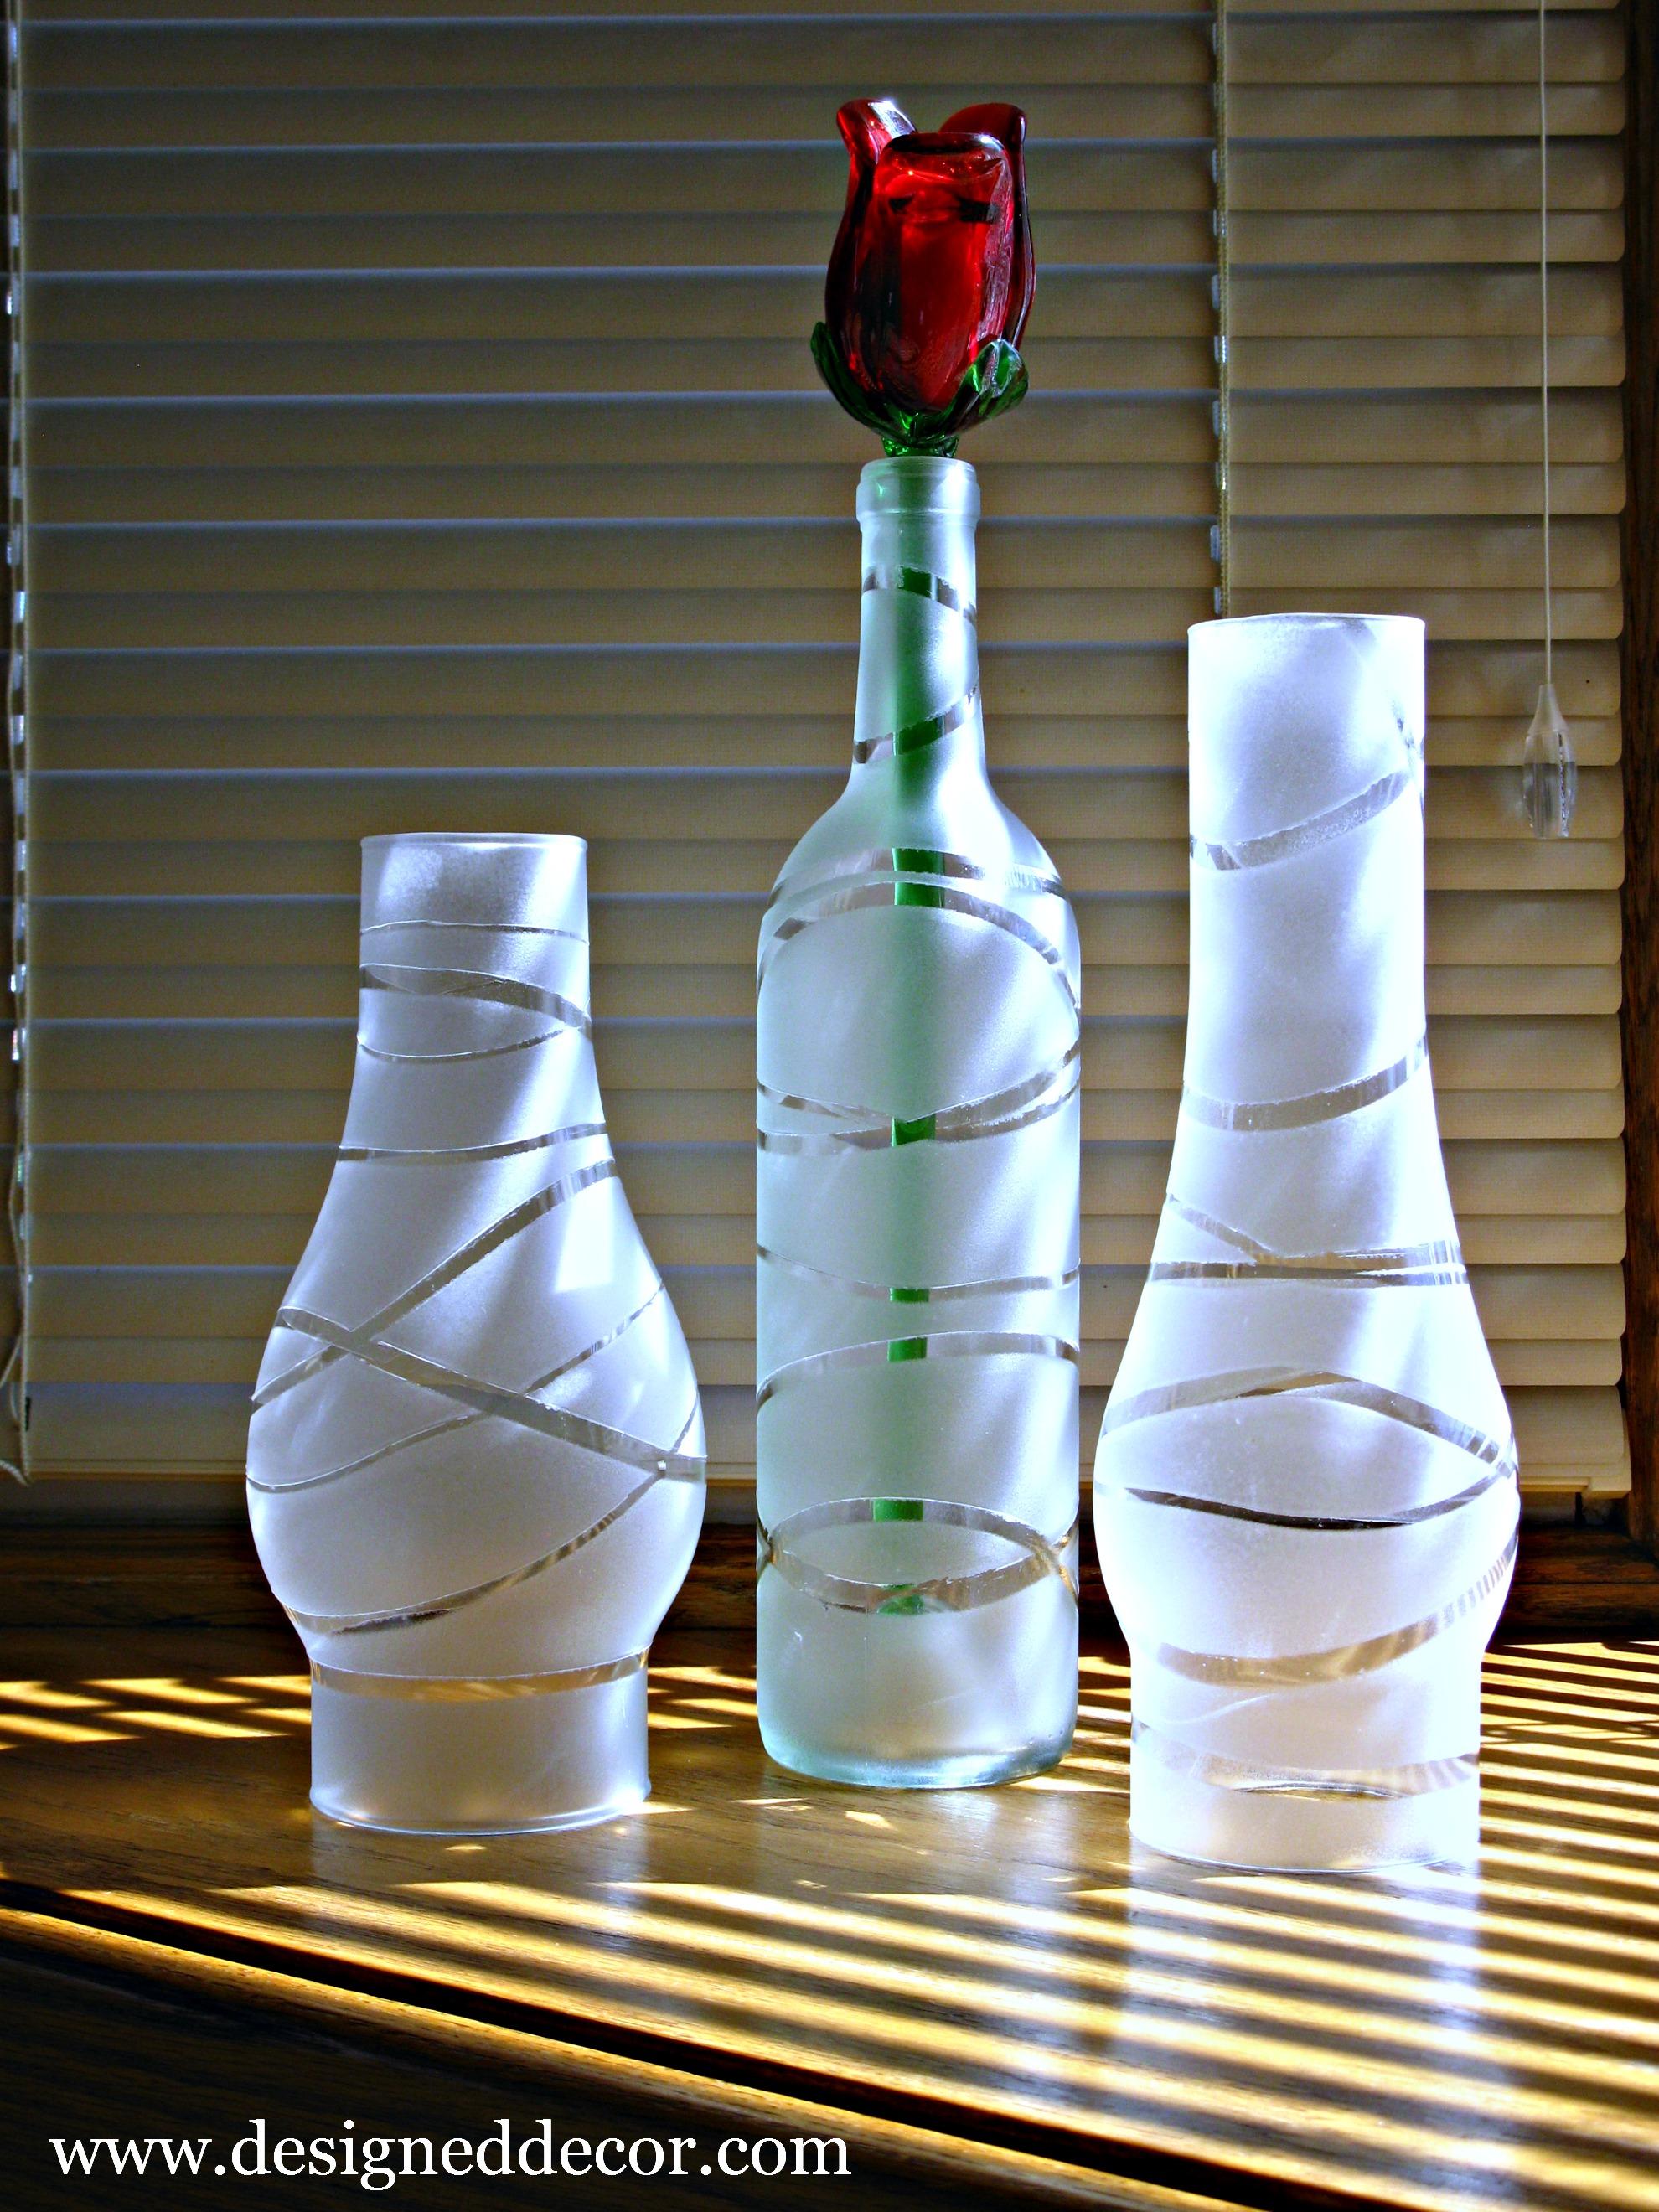 DIY: Painted Jars and Bottles - Designed Decor